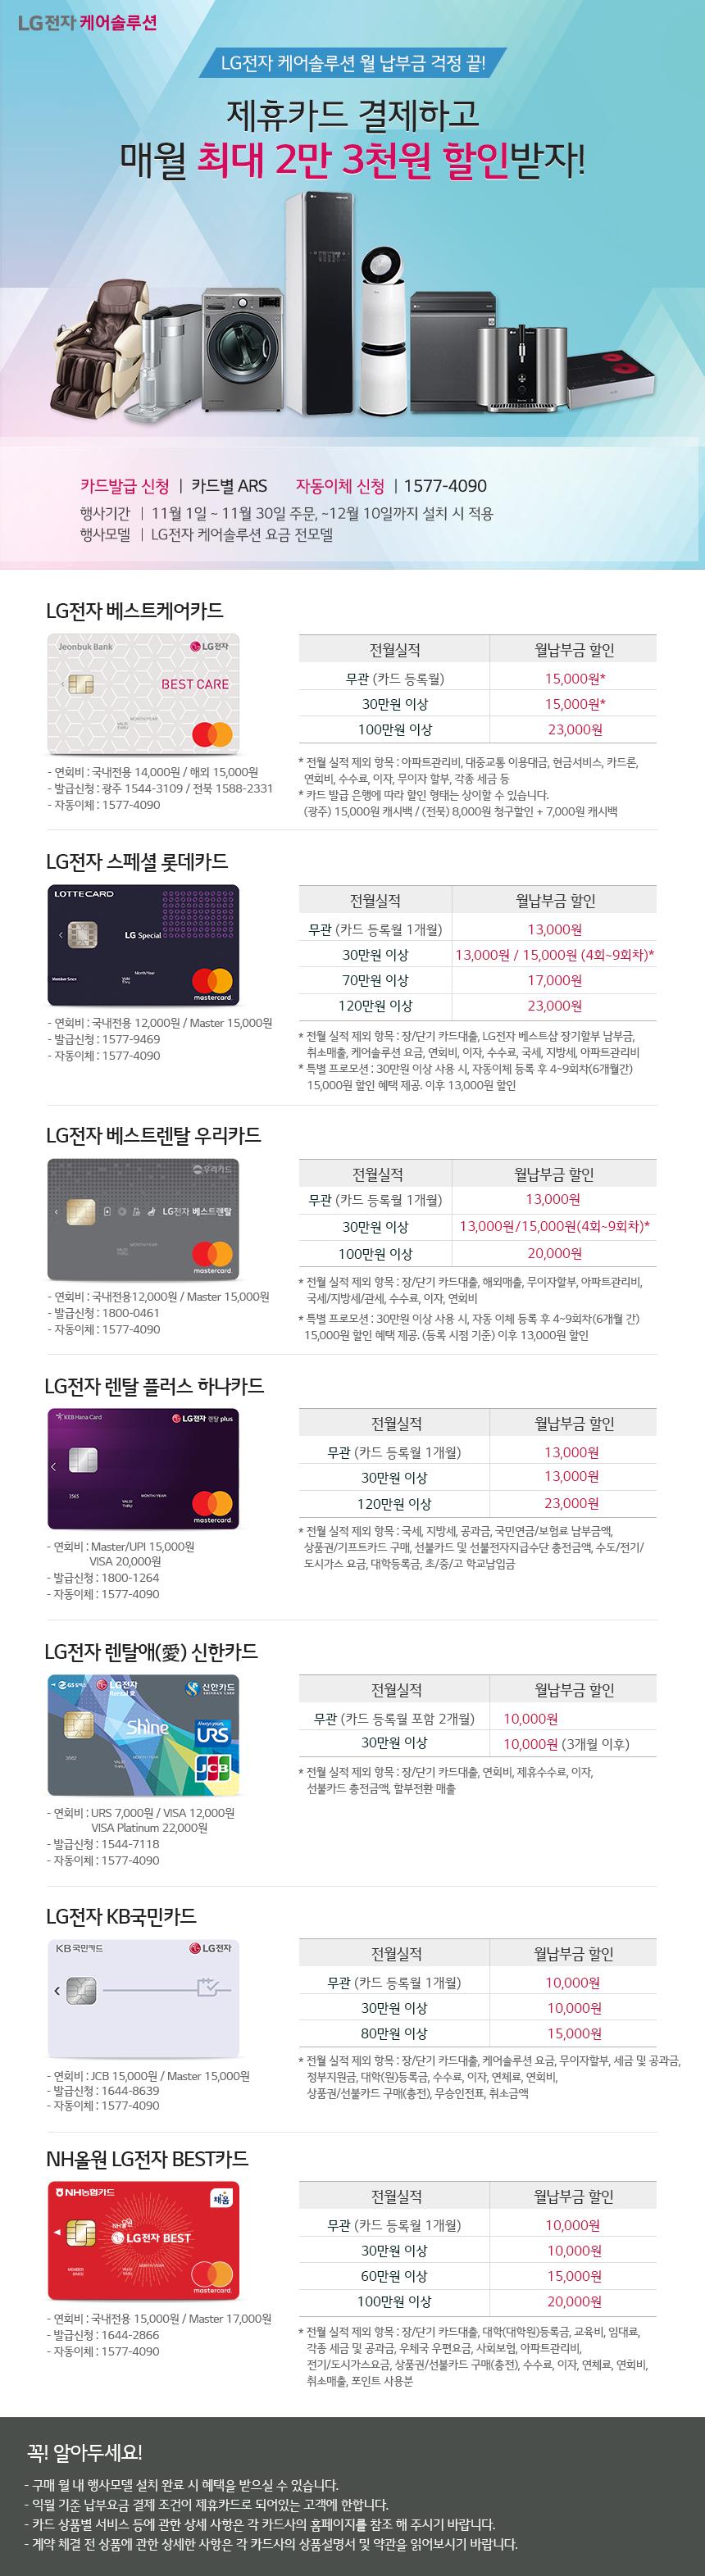 [USP 배너 - 판촉] 제휴 카드 할인 이벤트.jpg